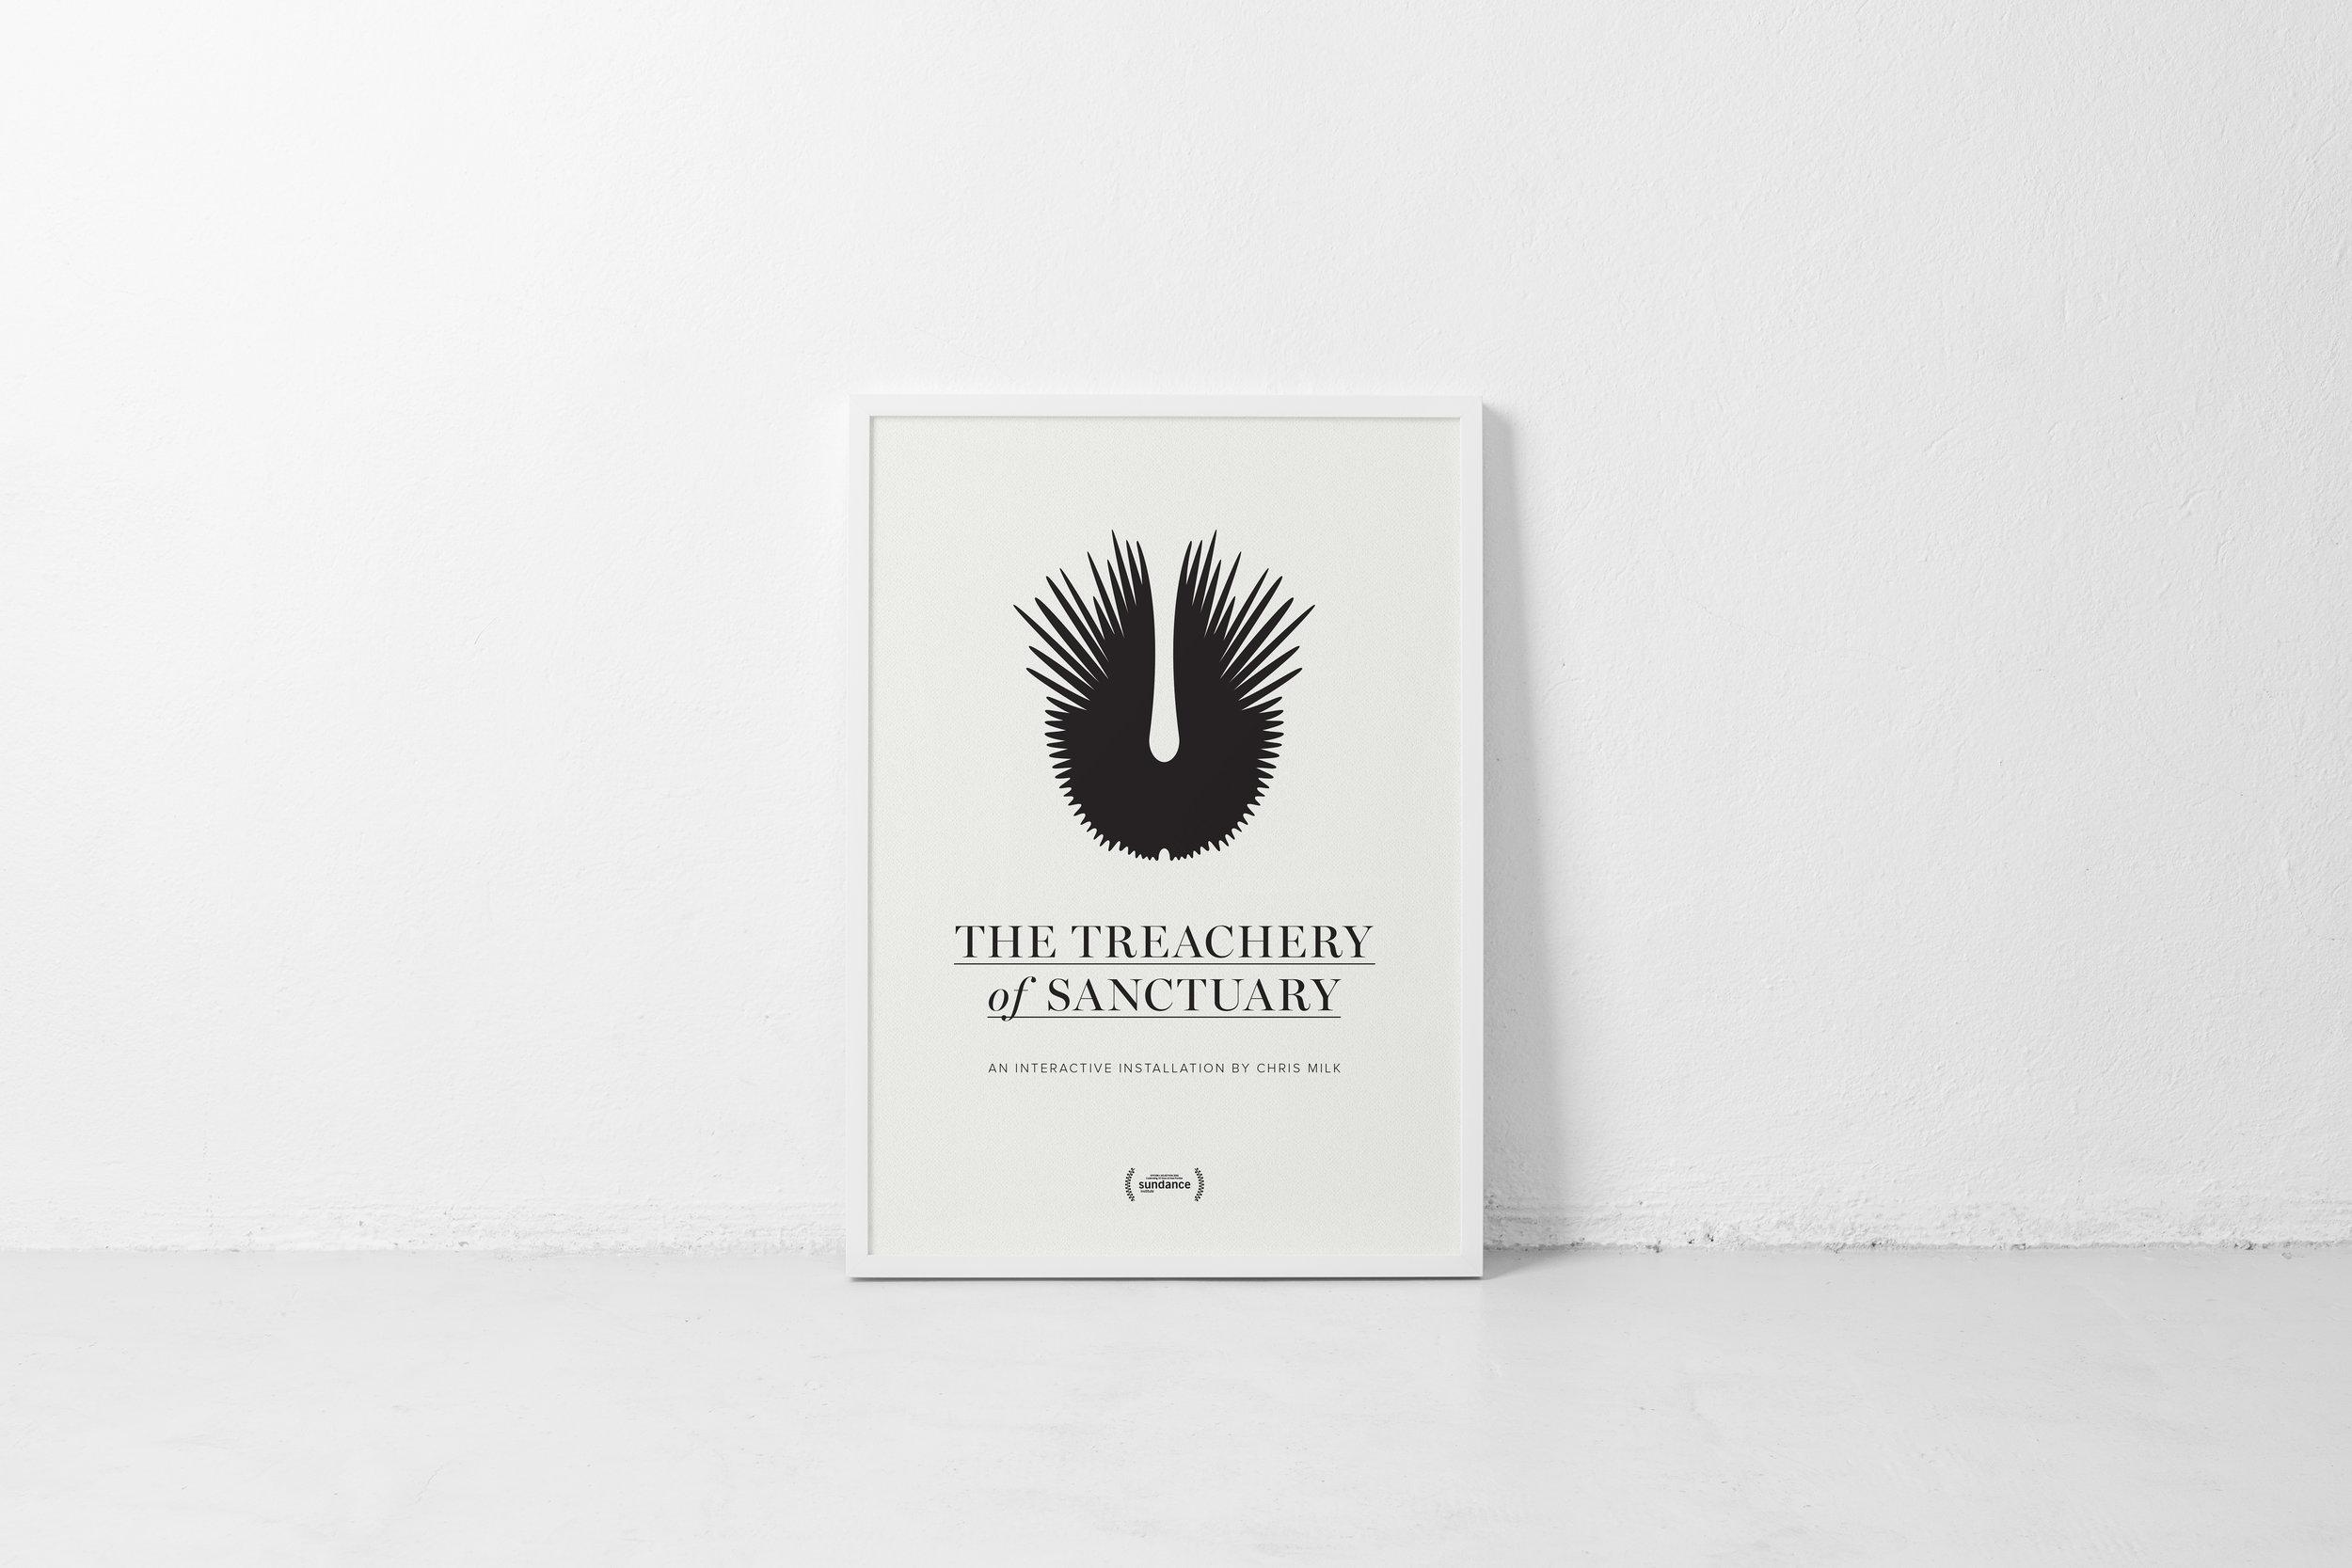 Treachery of Sanctuary at Sundance  Created with Chris Milk